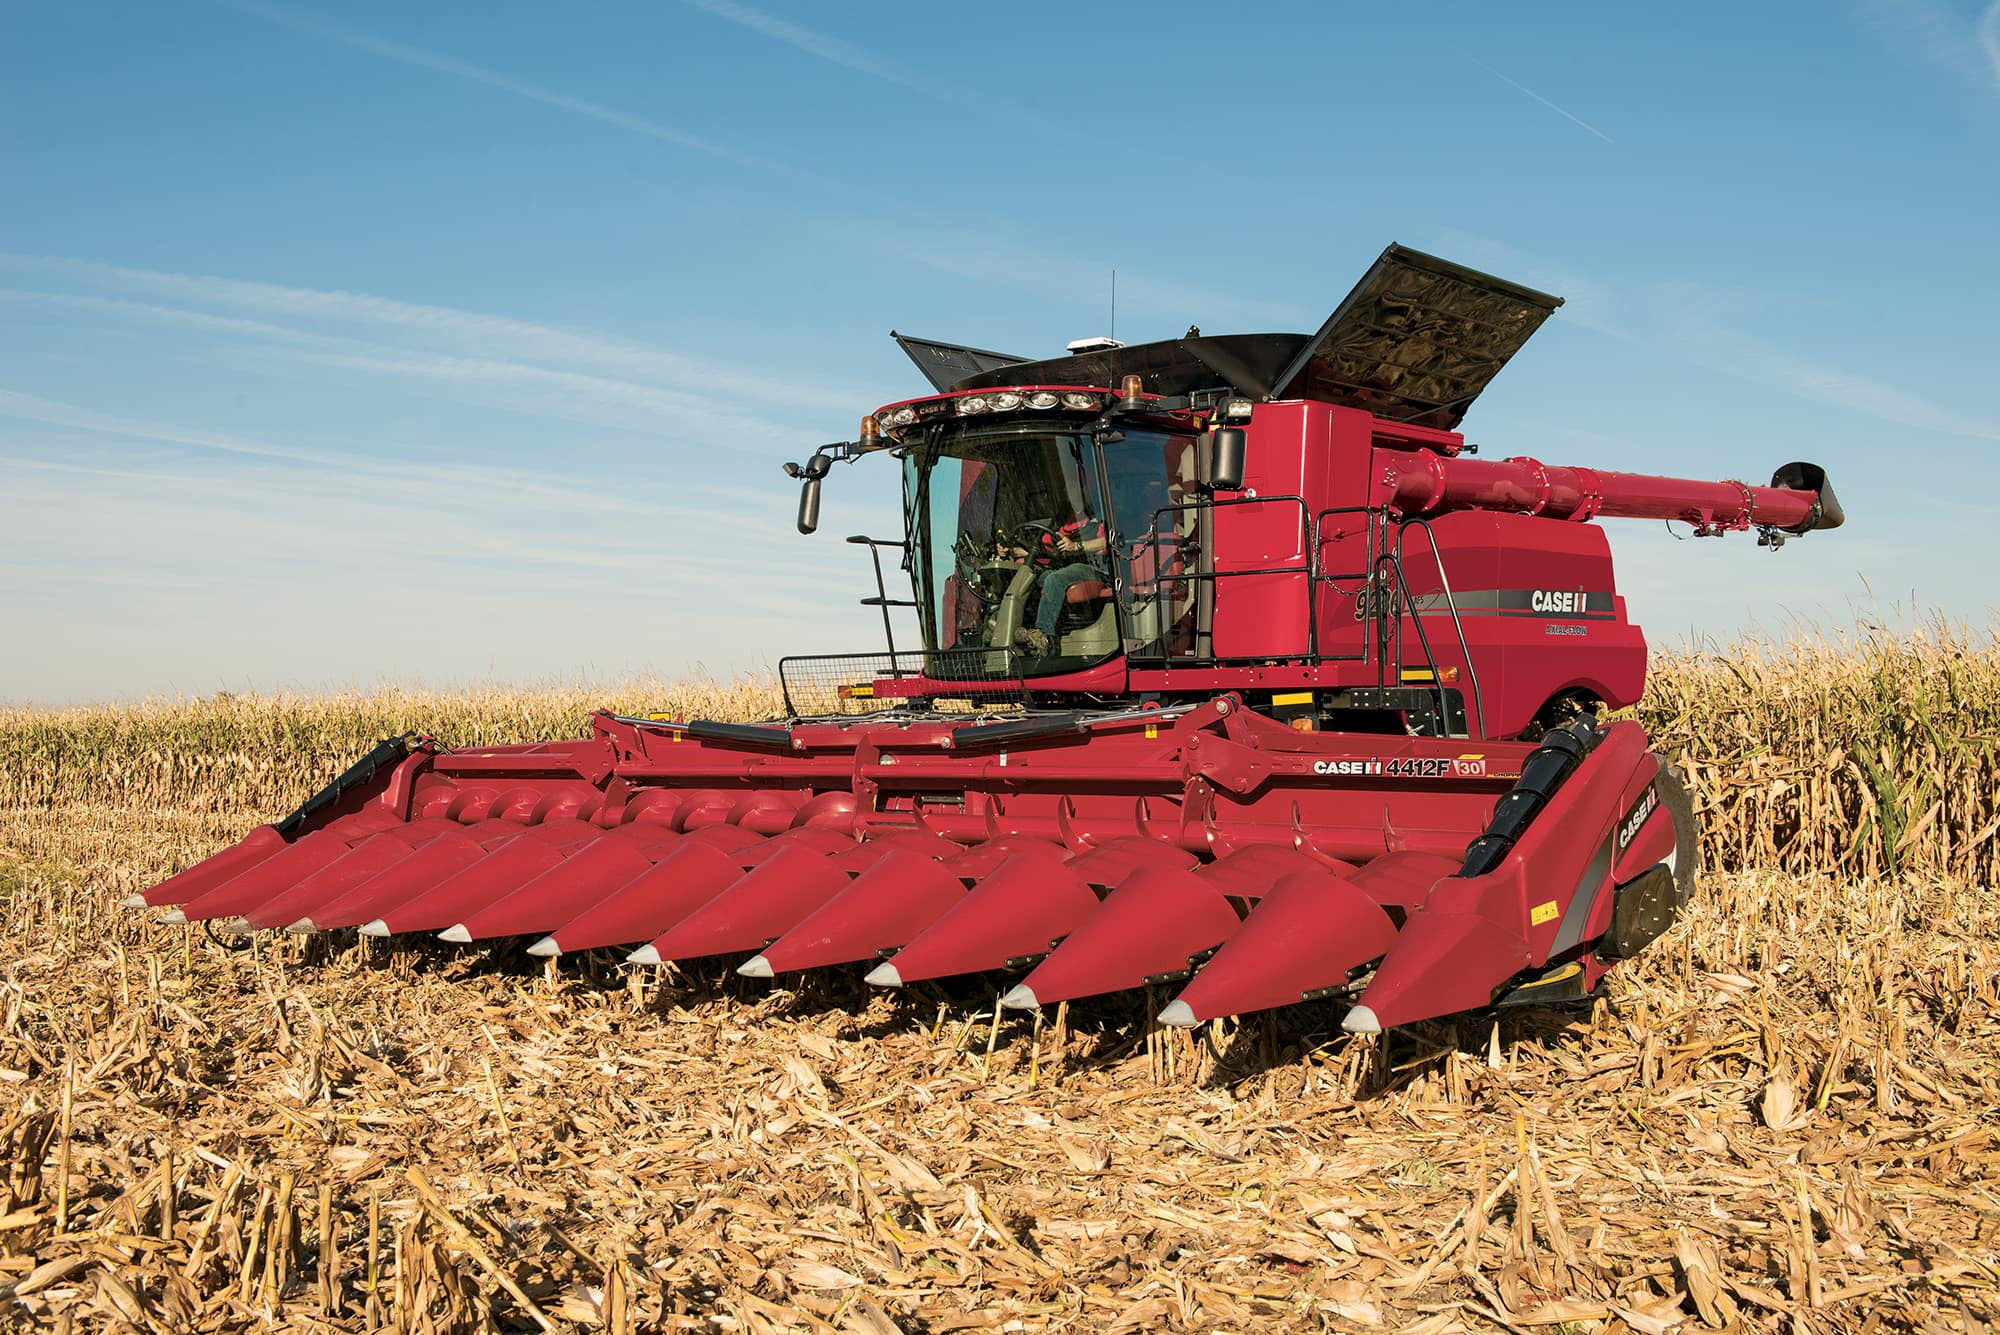 Wiring Diagram 2388 Combine 27 Images Case Ih 1586 Schematic Axial Flow 9230 10 13 1909width500height300 Corn Heads Harvester Equipment